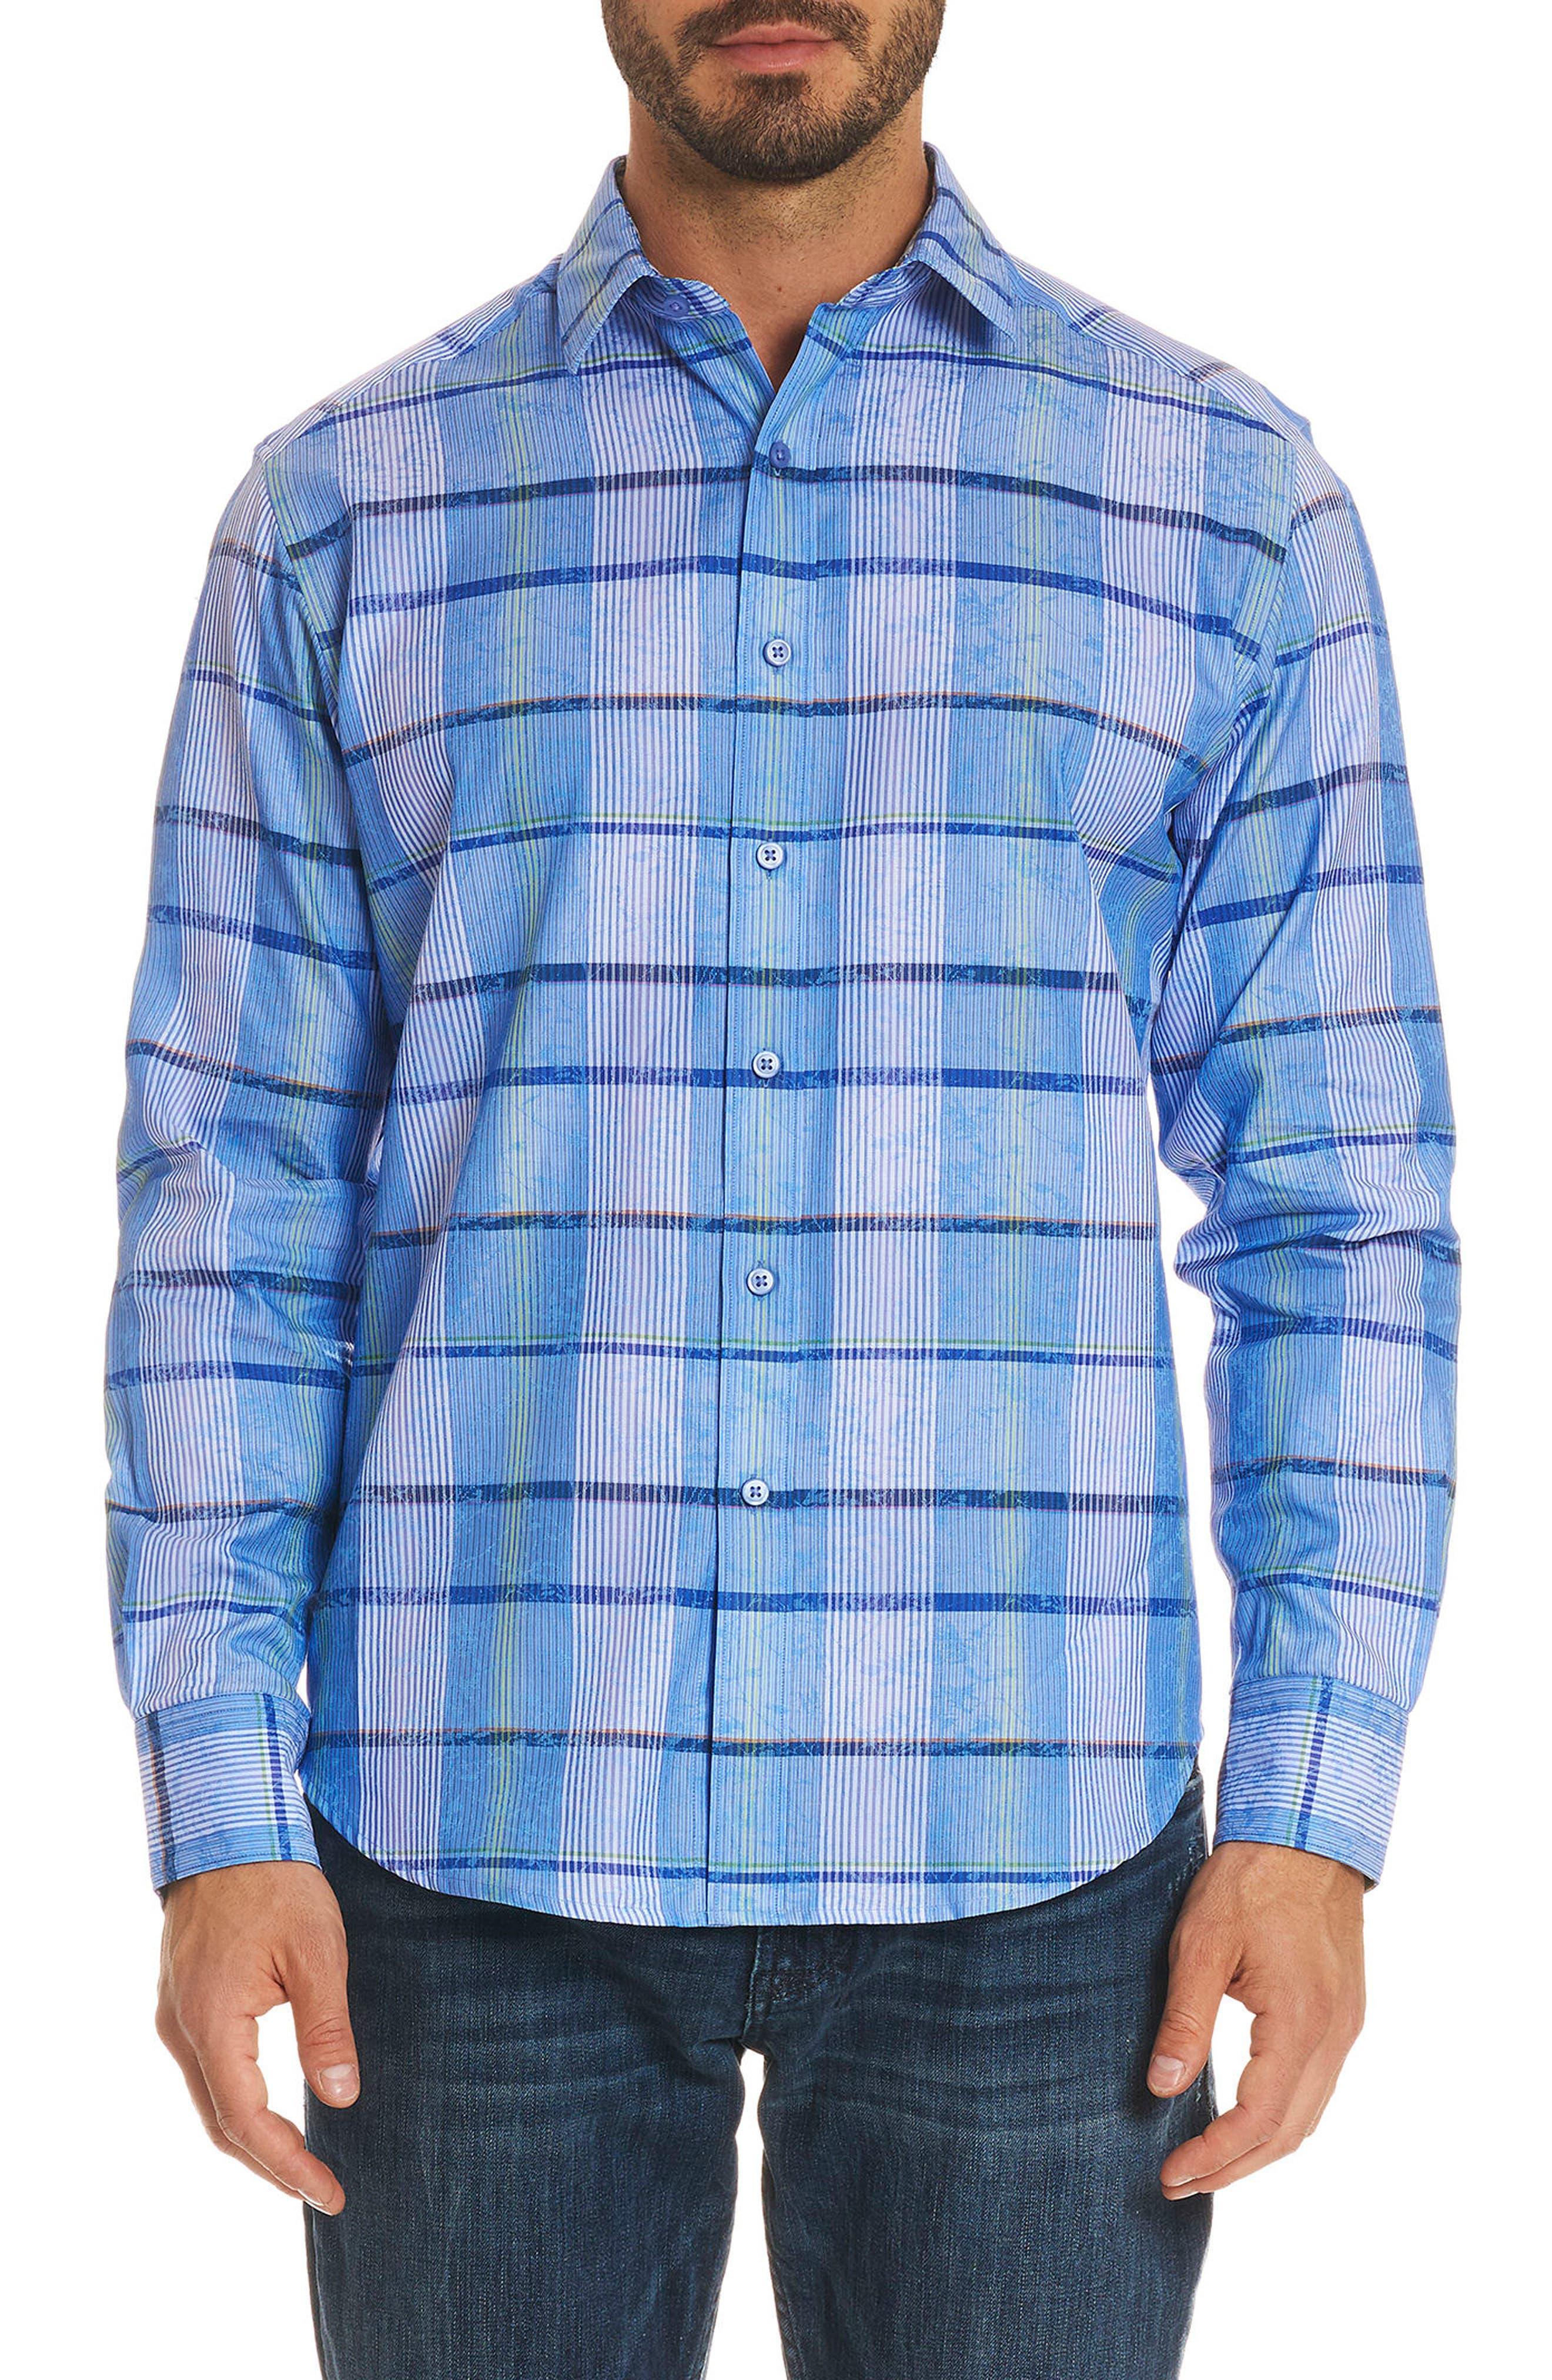 Ferro Classic Fit Sport Shirt,                             Main thumbnail 1, color,                             400